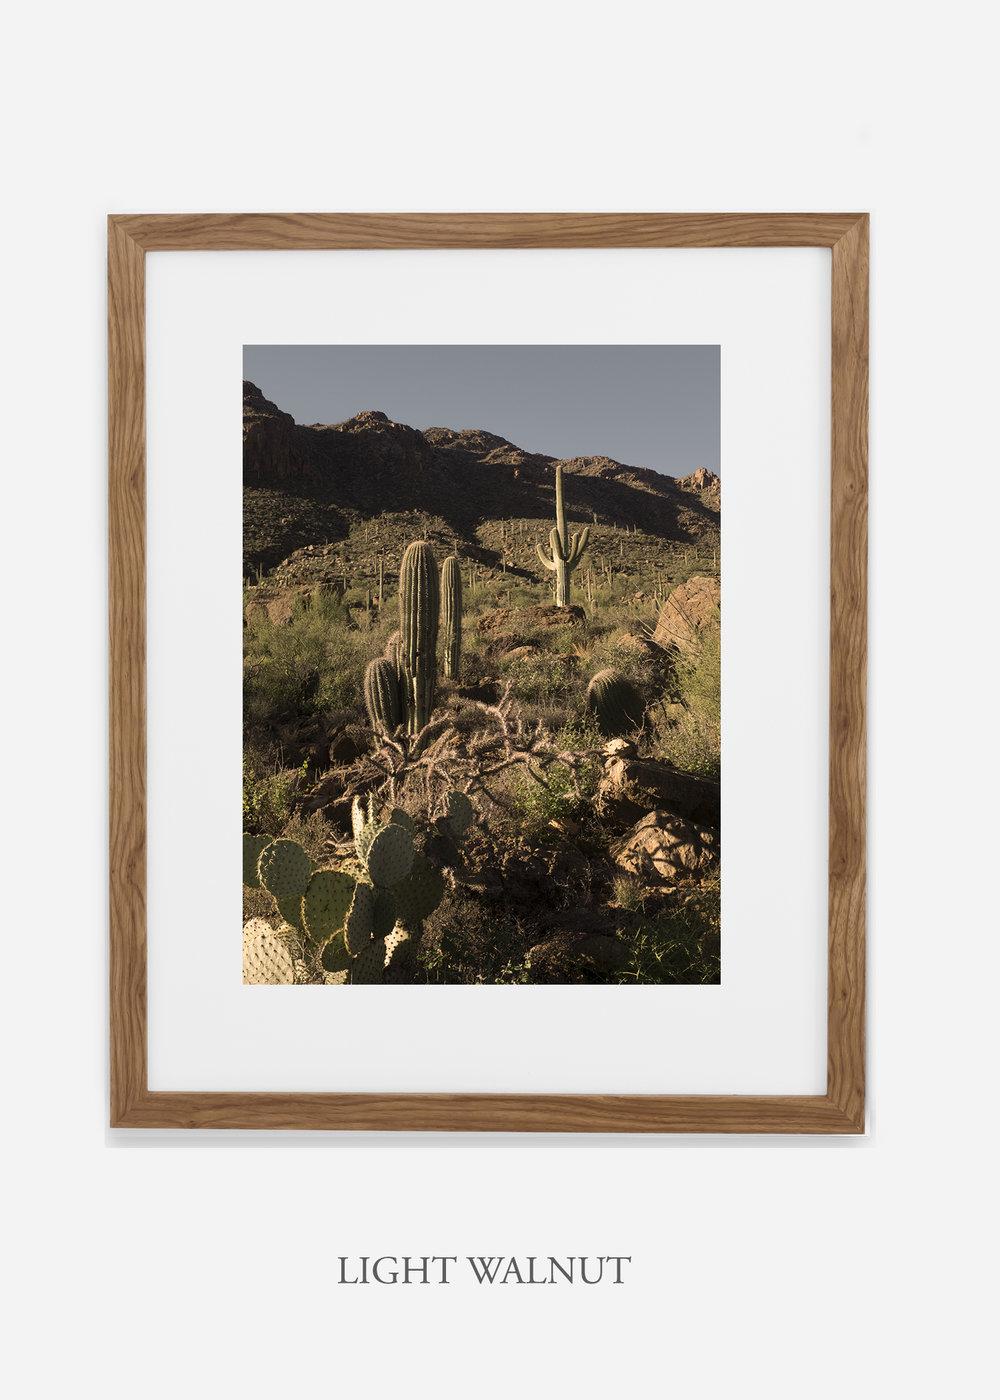 lightwalnutframe-saguaroNo.18-wildercalifornia-art-wallart-cactusprint-homedecor-prints-arizona-botanical-artwork-interiordesign.jpg